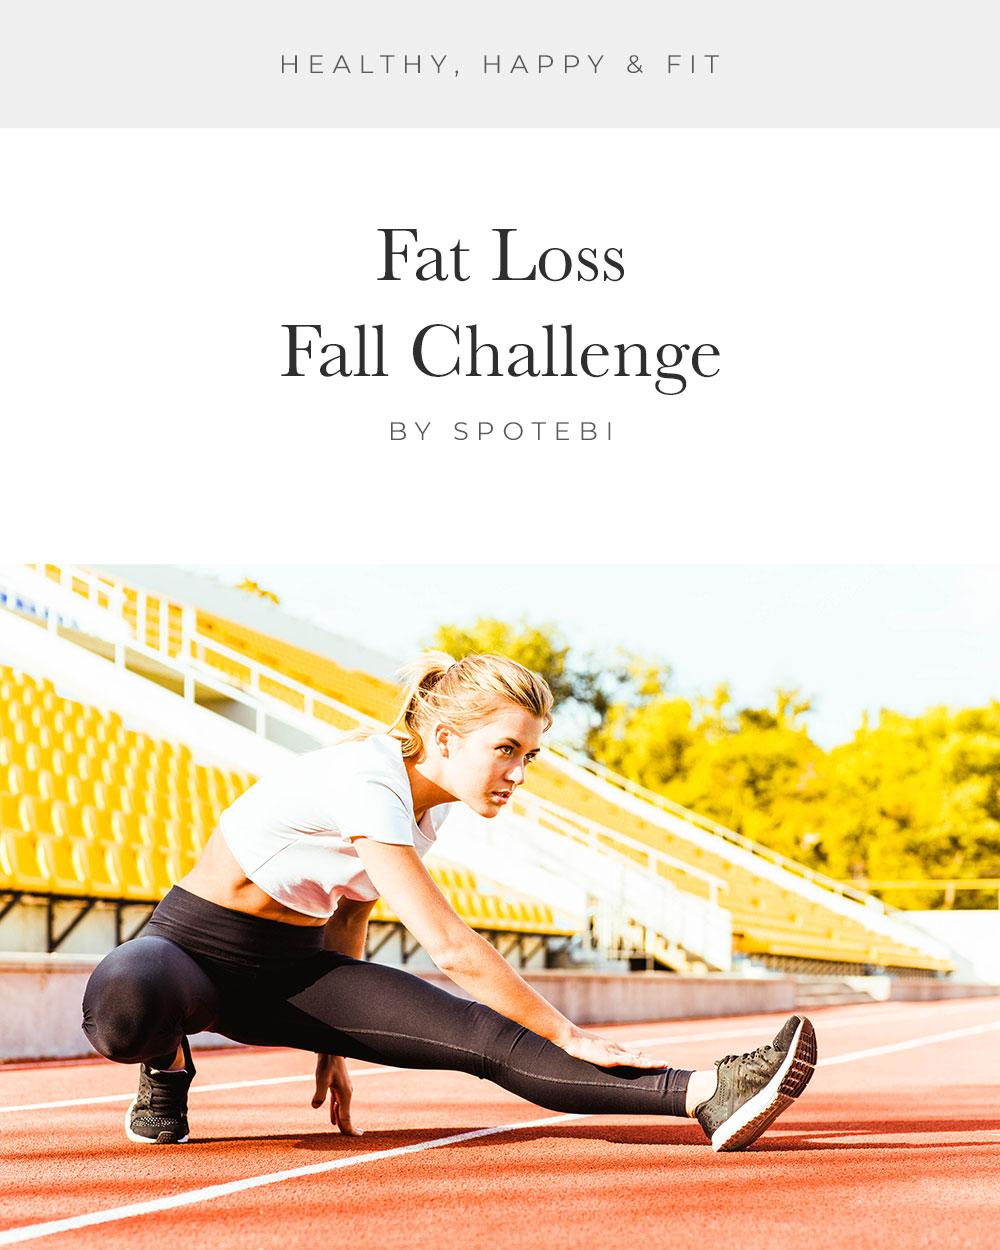 Fat Loss Fall Challenge